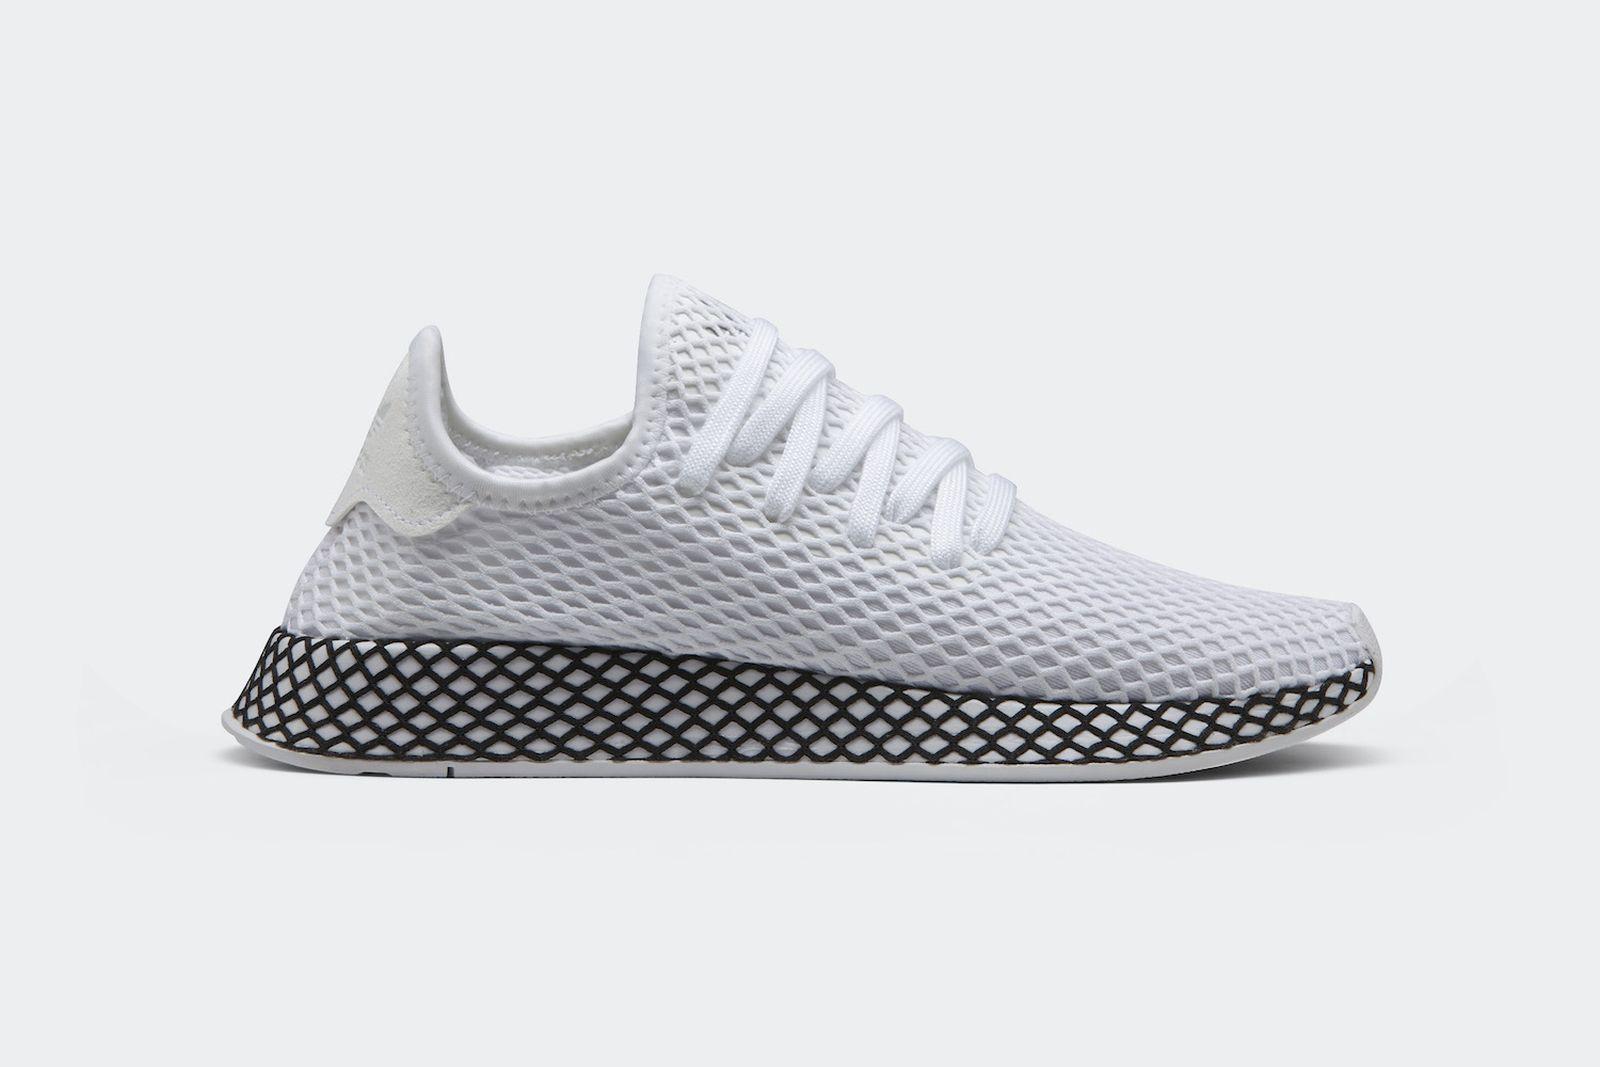 adidas deerupt july colorways release date price info